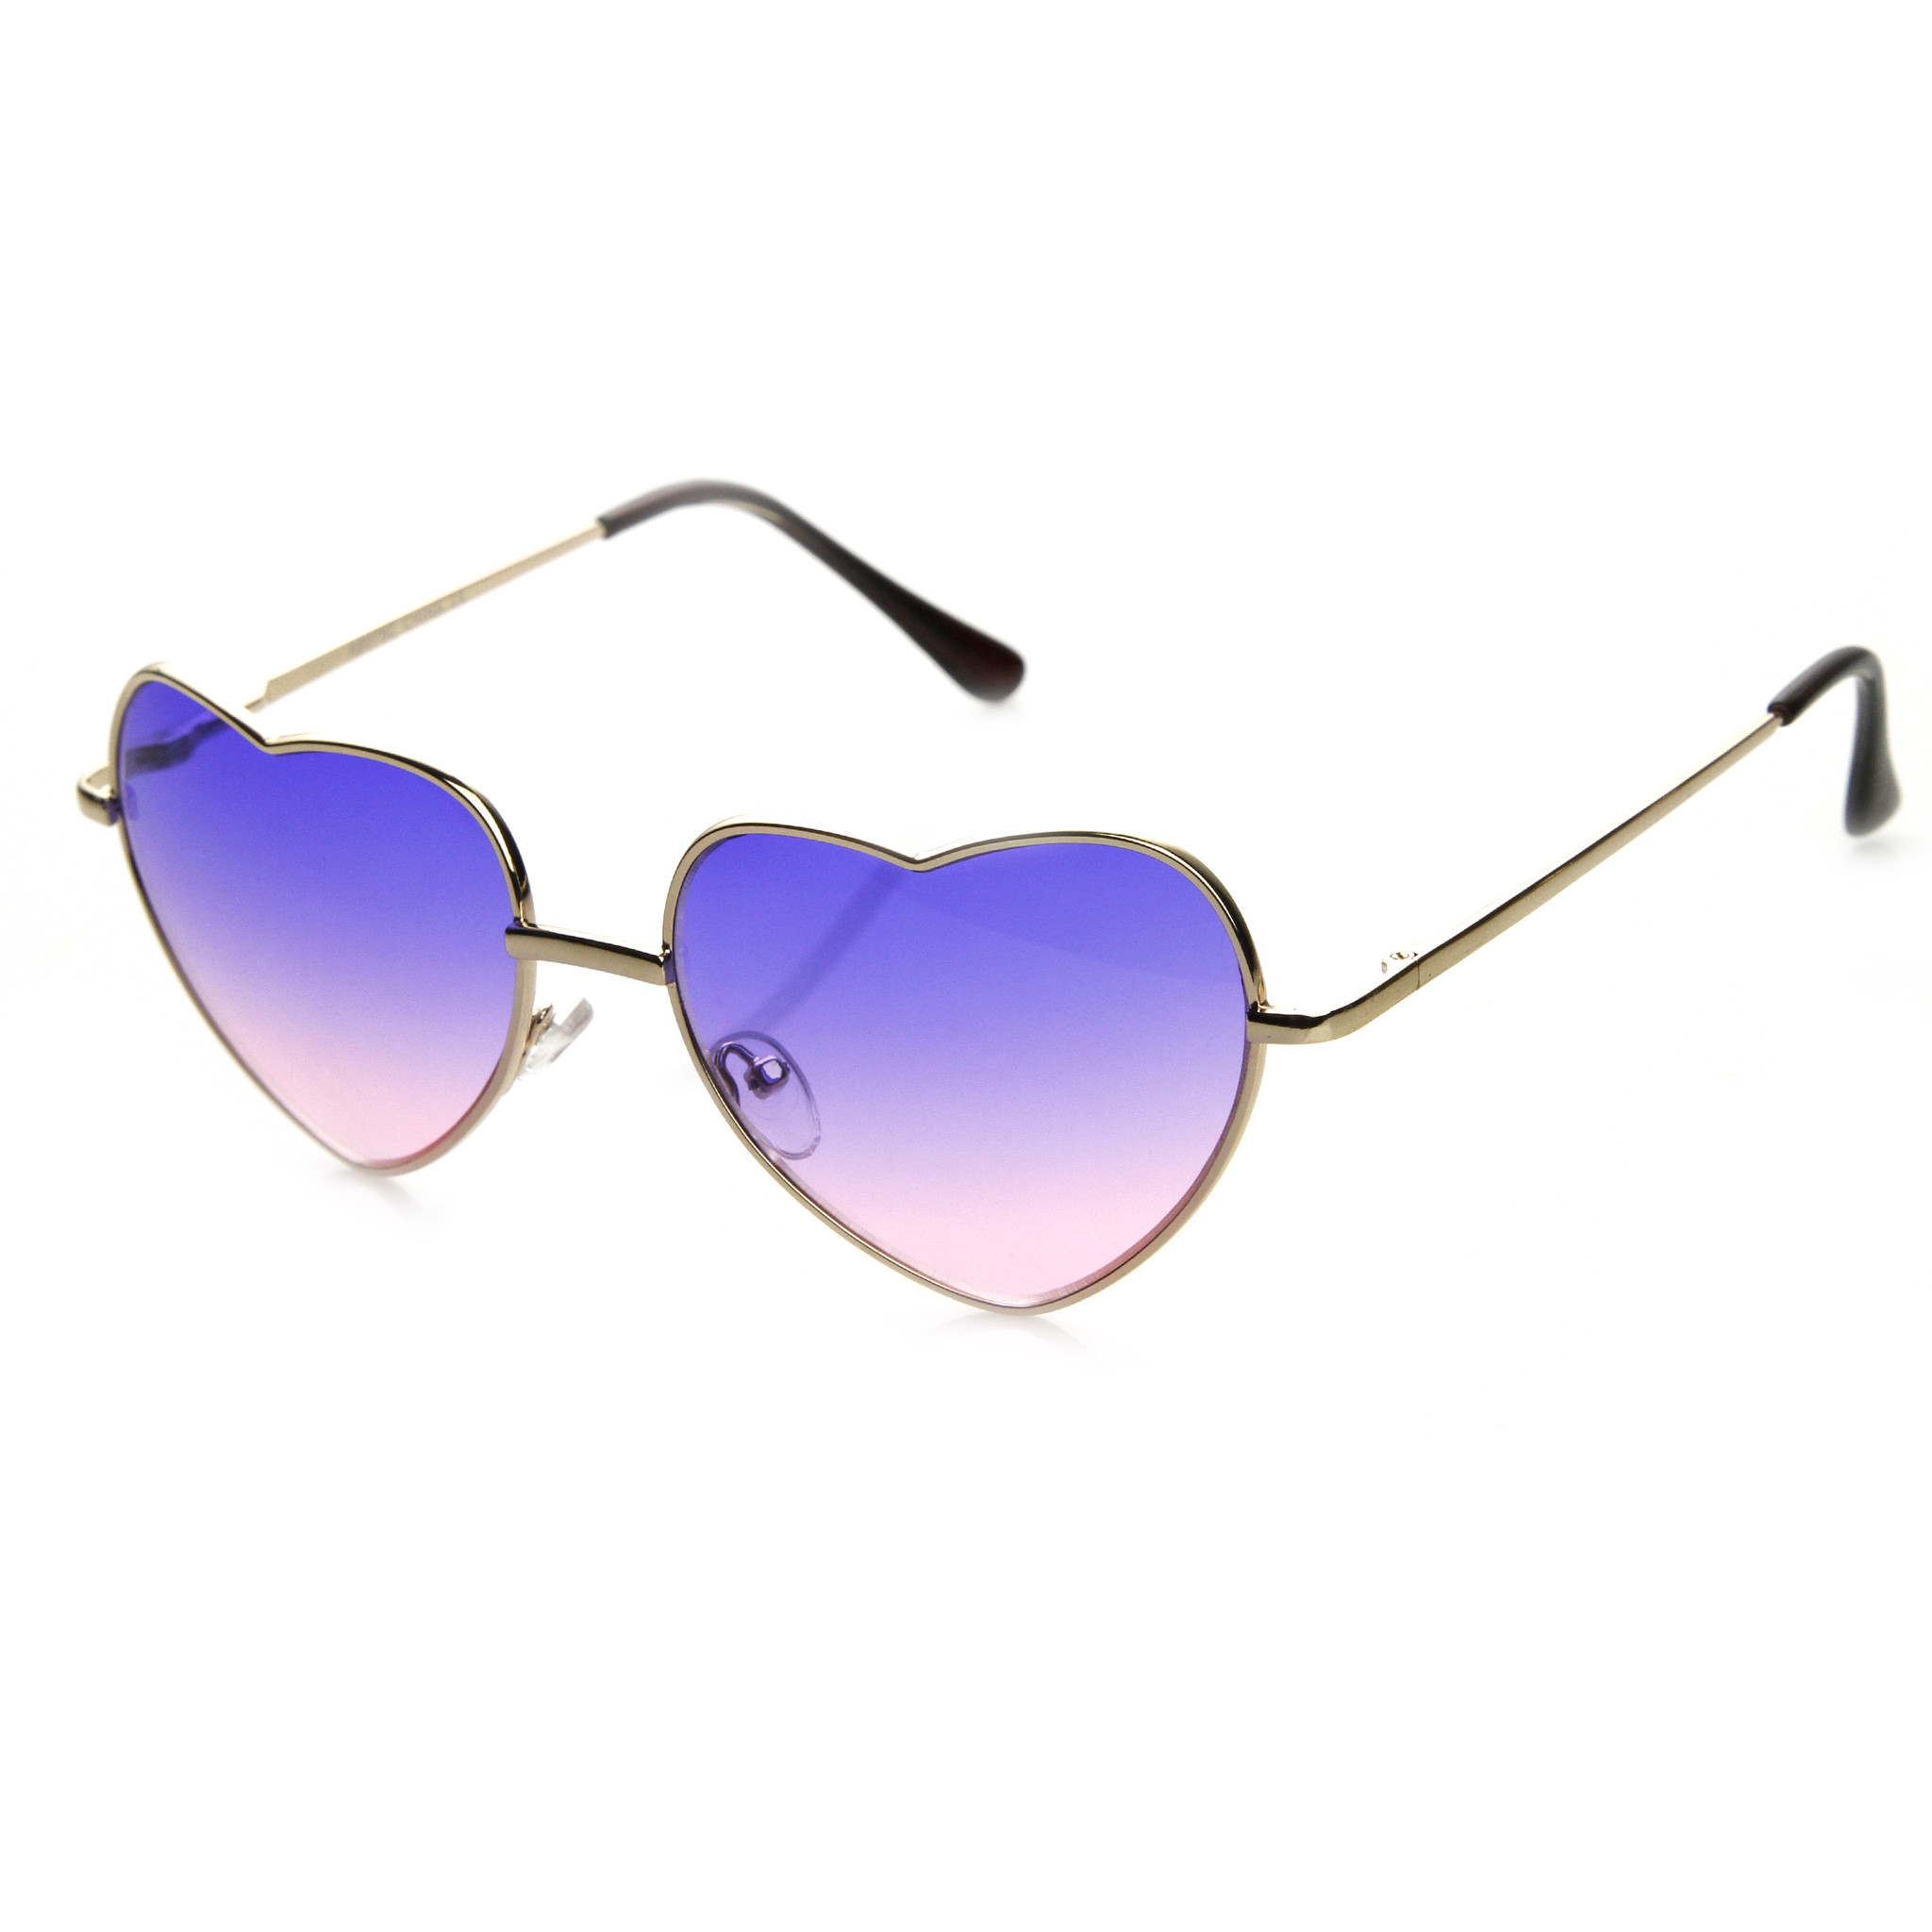 Super Cute Retro Metal Heart Shape Sunglasses With Rainbow Color Lens